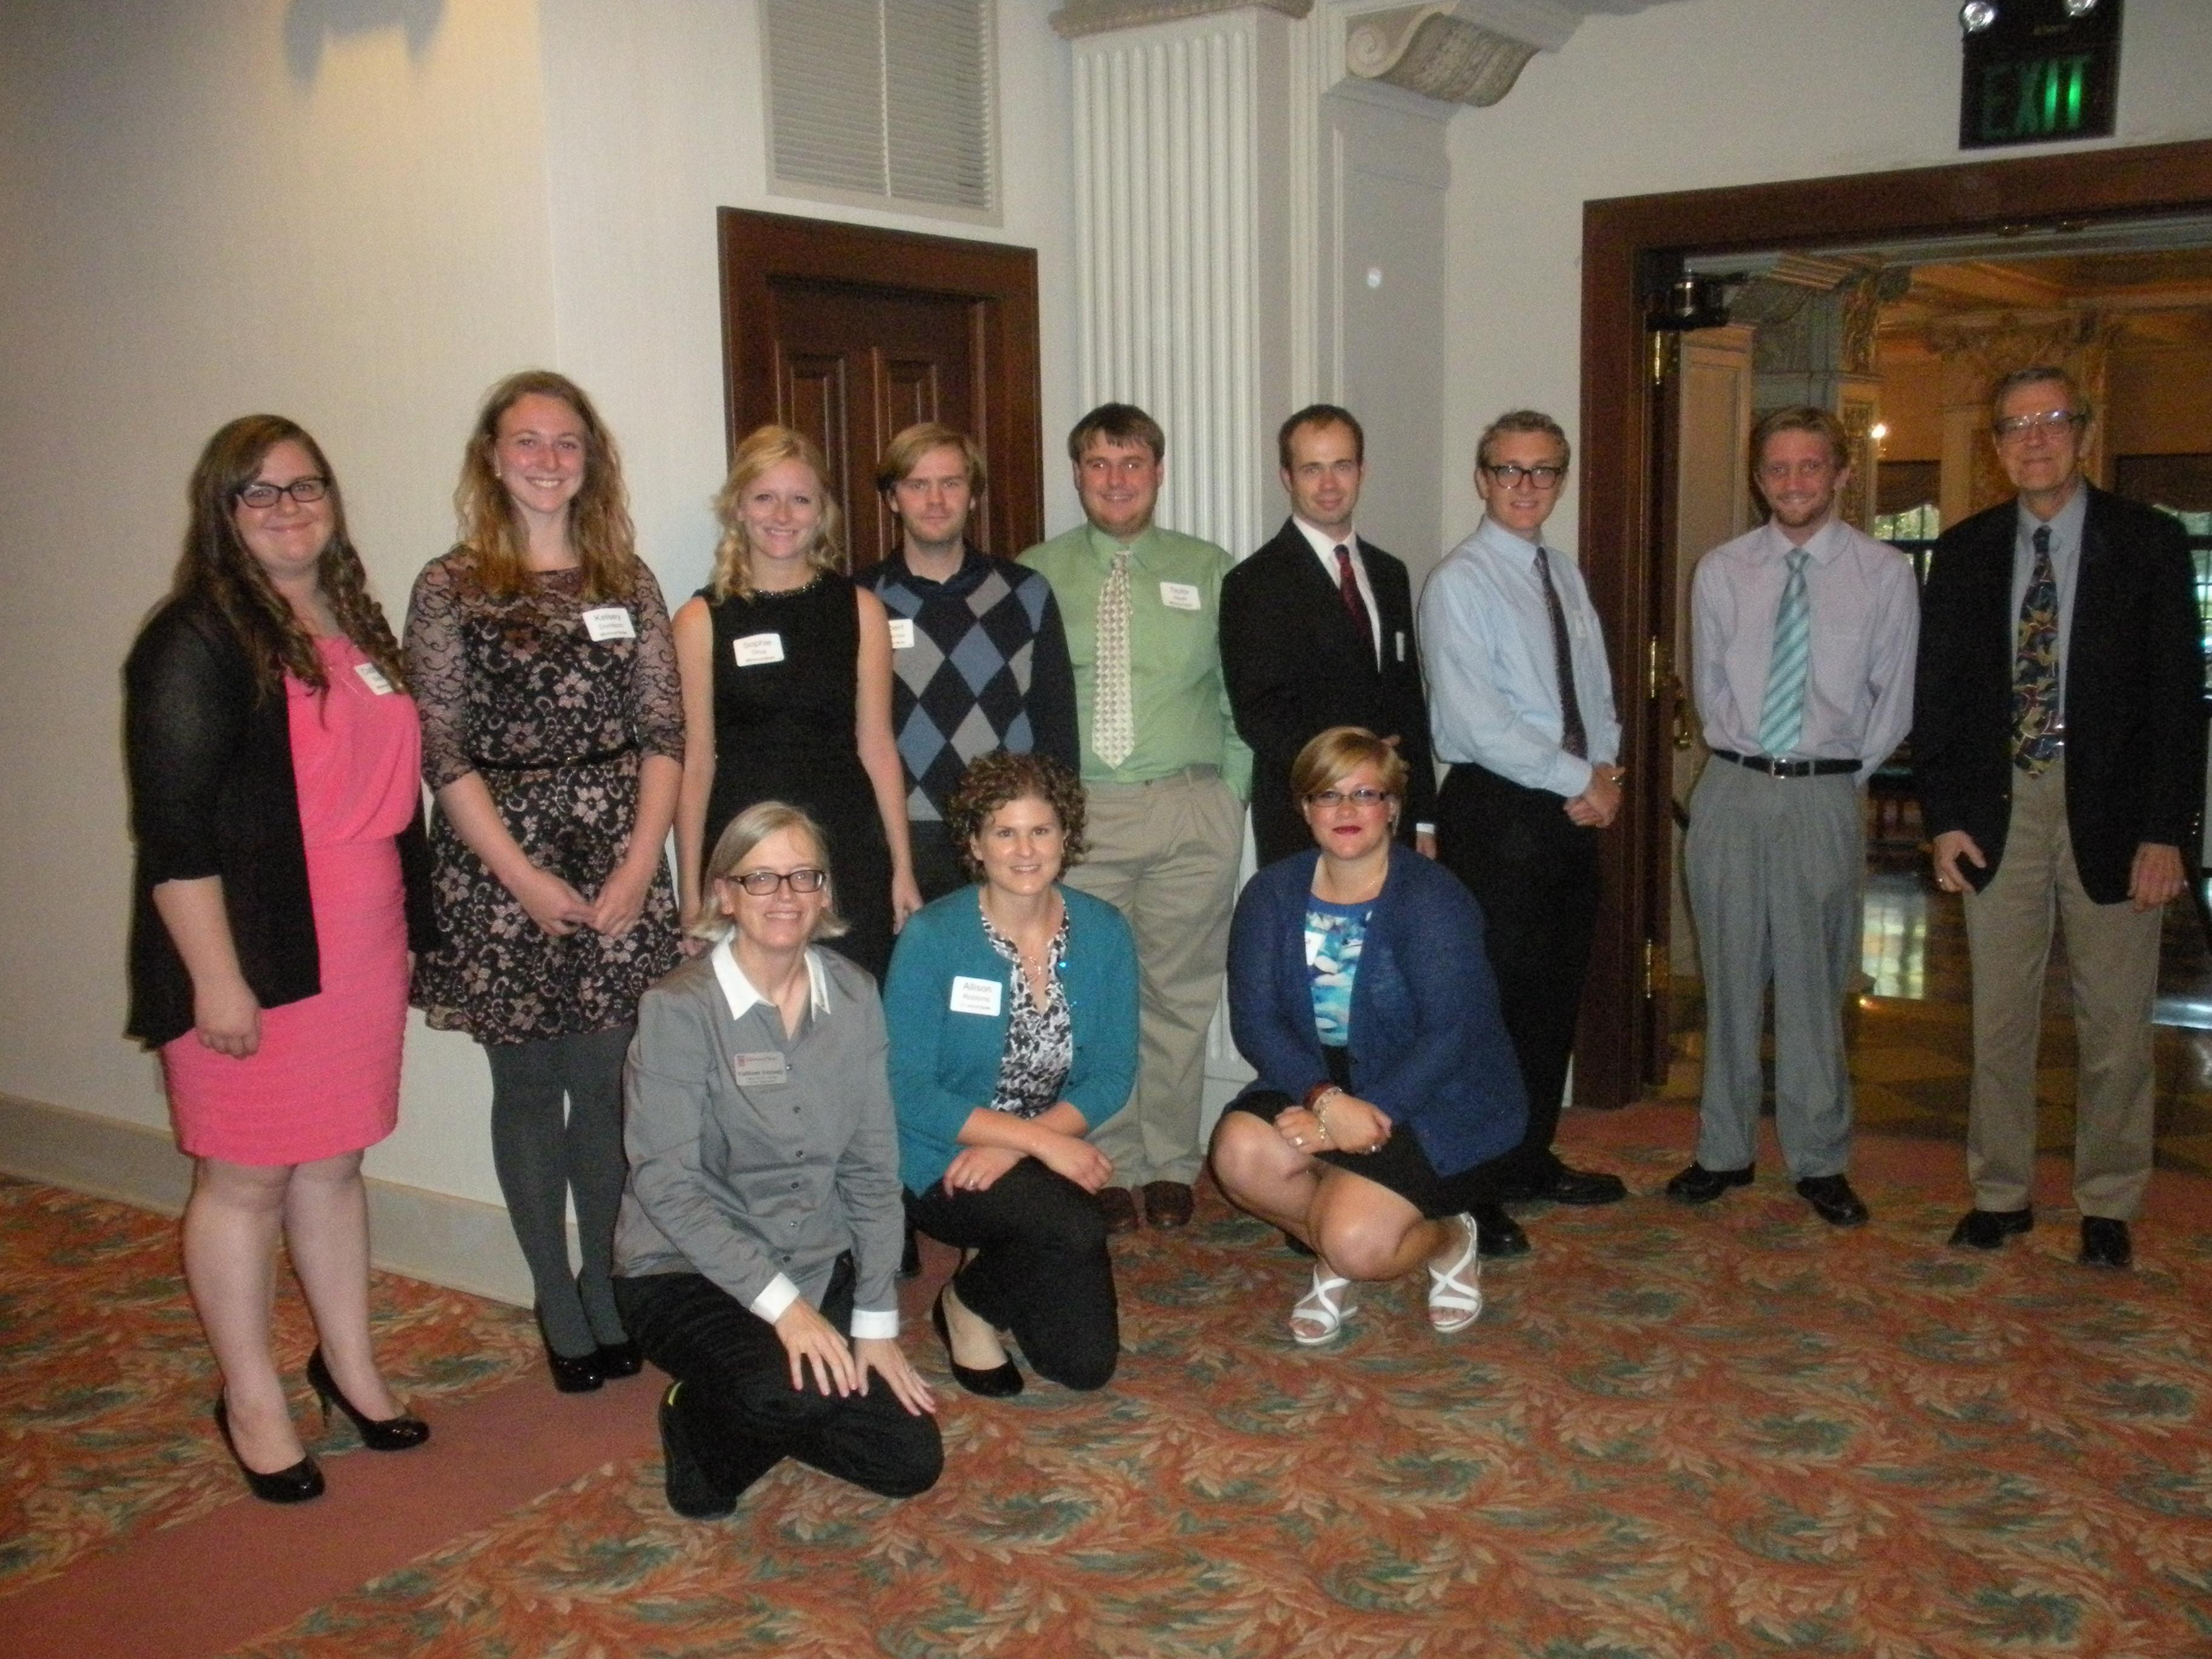 12th Annual Scholarship Banquet